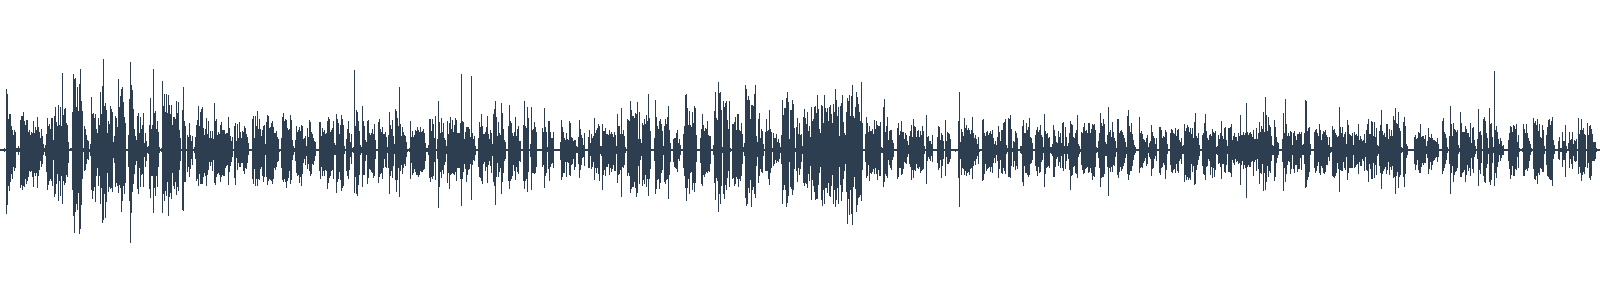 Ezopove bájky waveform